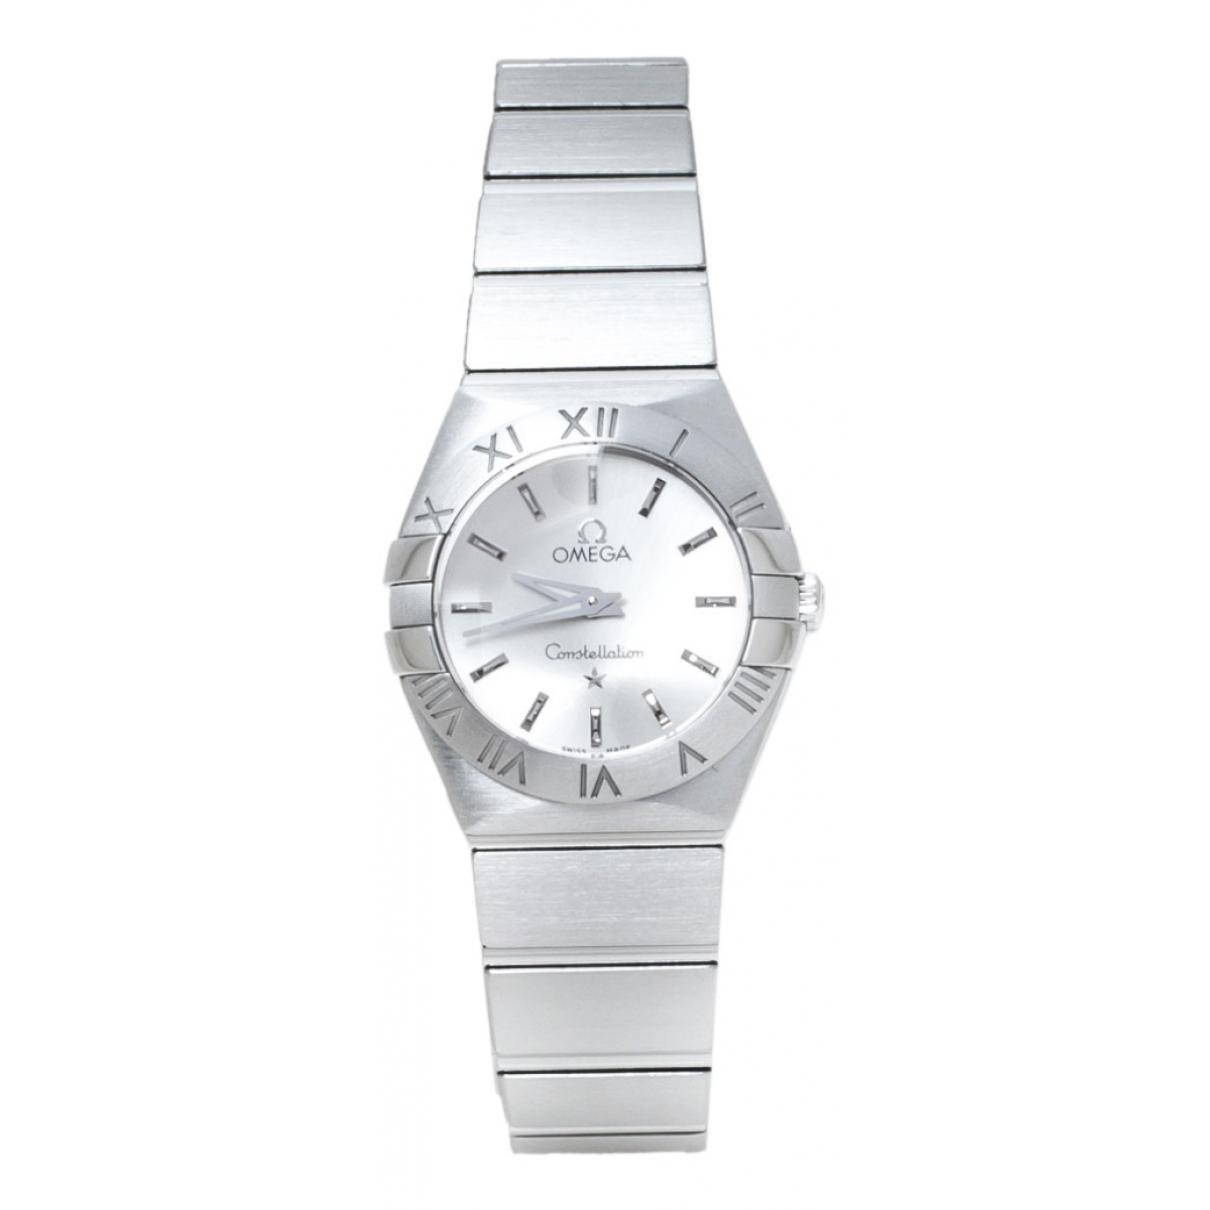 Omega Constellation Uhr in  Silber Stahl